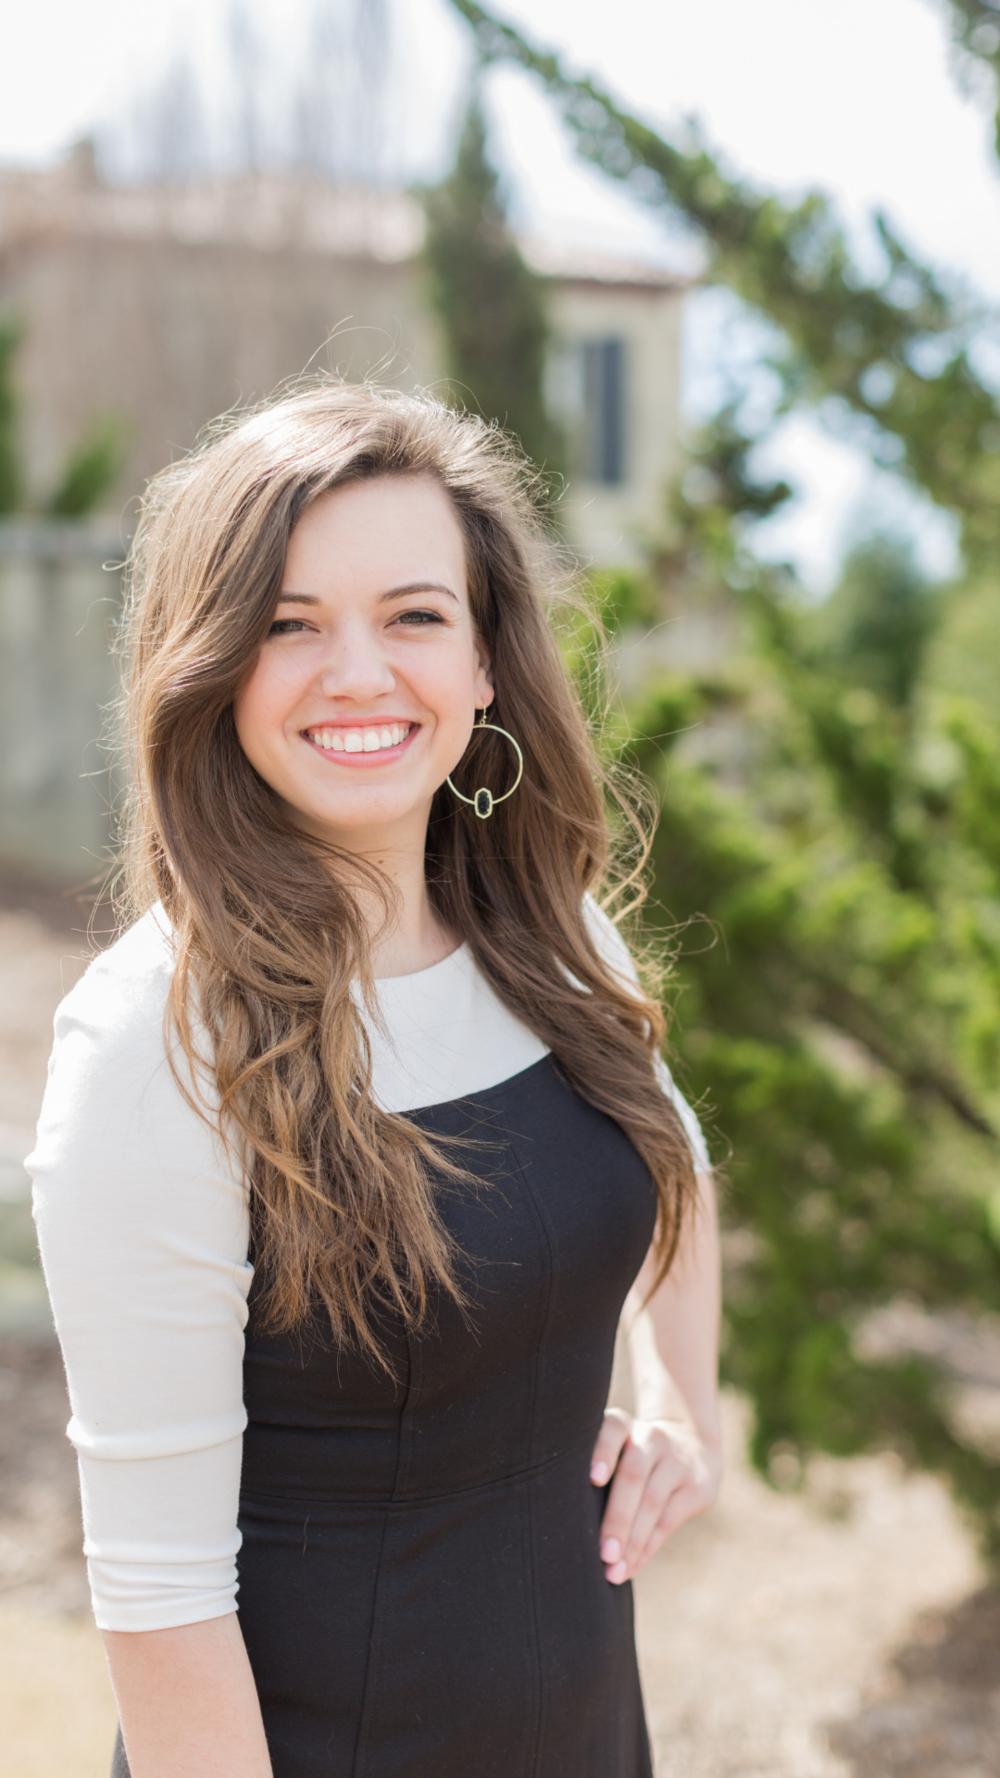 Bespoken Team | Savannah Ward | Wedding and Event Planners in Greenville, SC